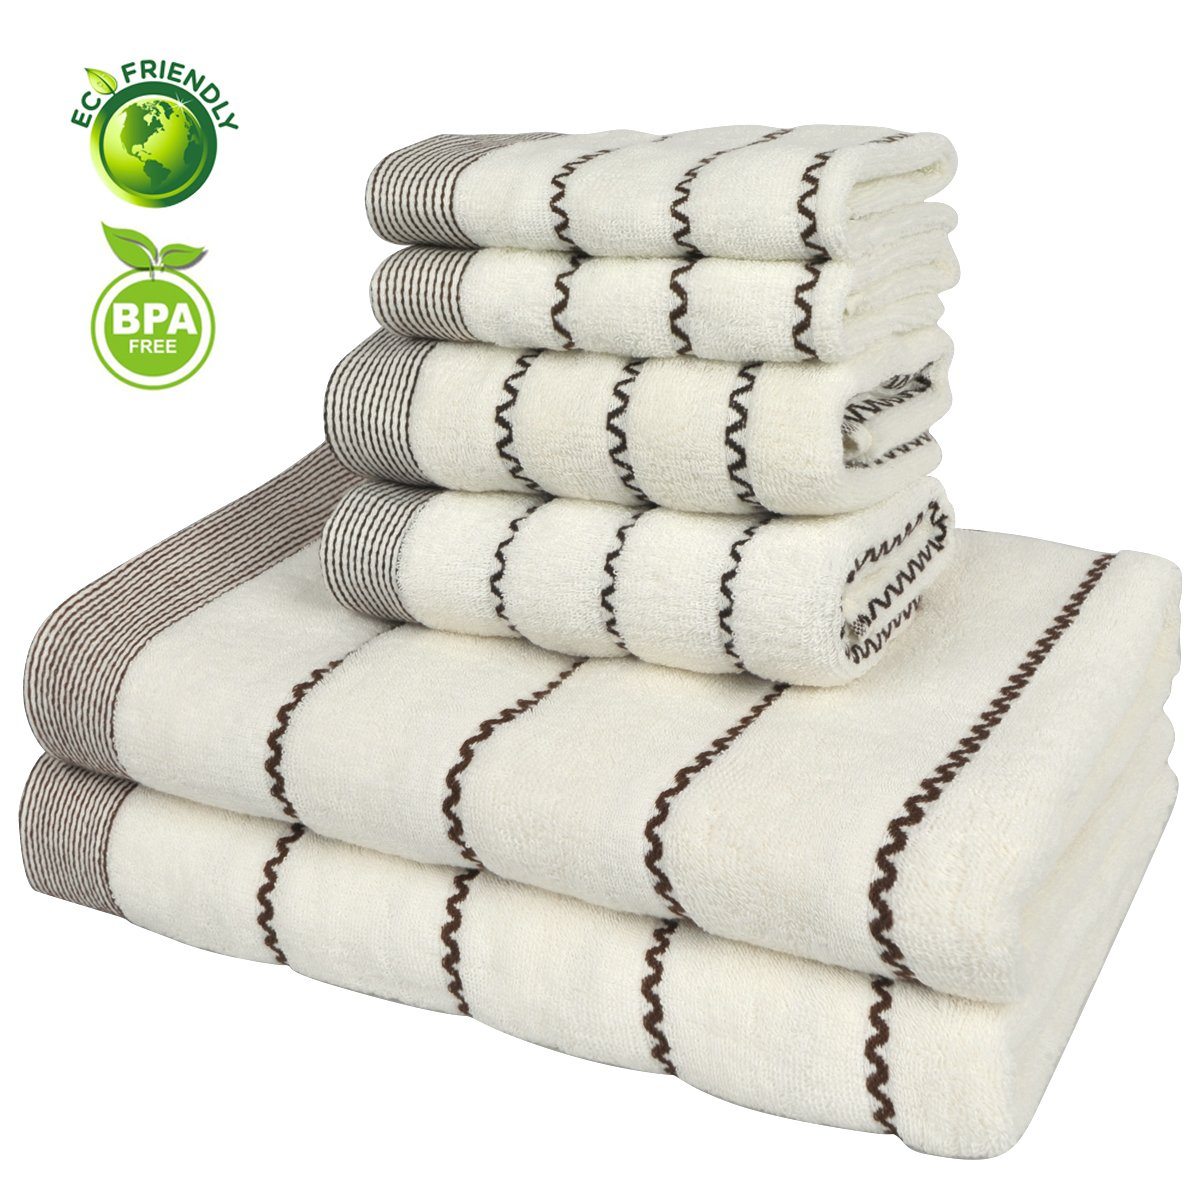 Vanca Bath Towels Sets Cotton Prime Soft Durable Absorbent Large Shower Beach Terry Luxury Classic Design Stripe Kids Towel (Beige)